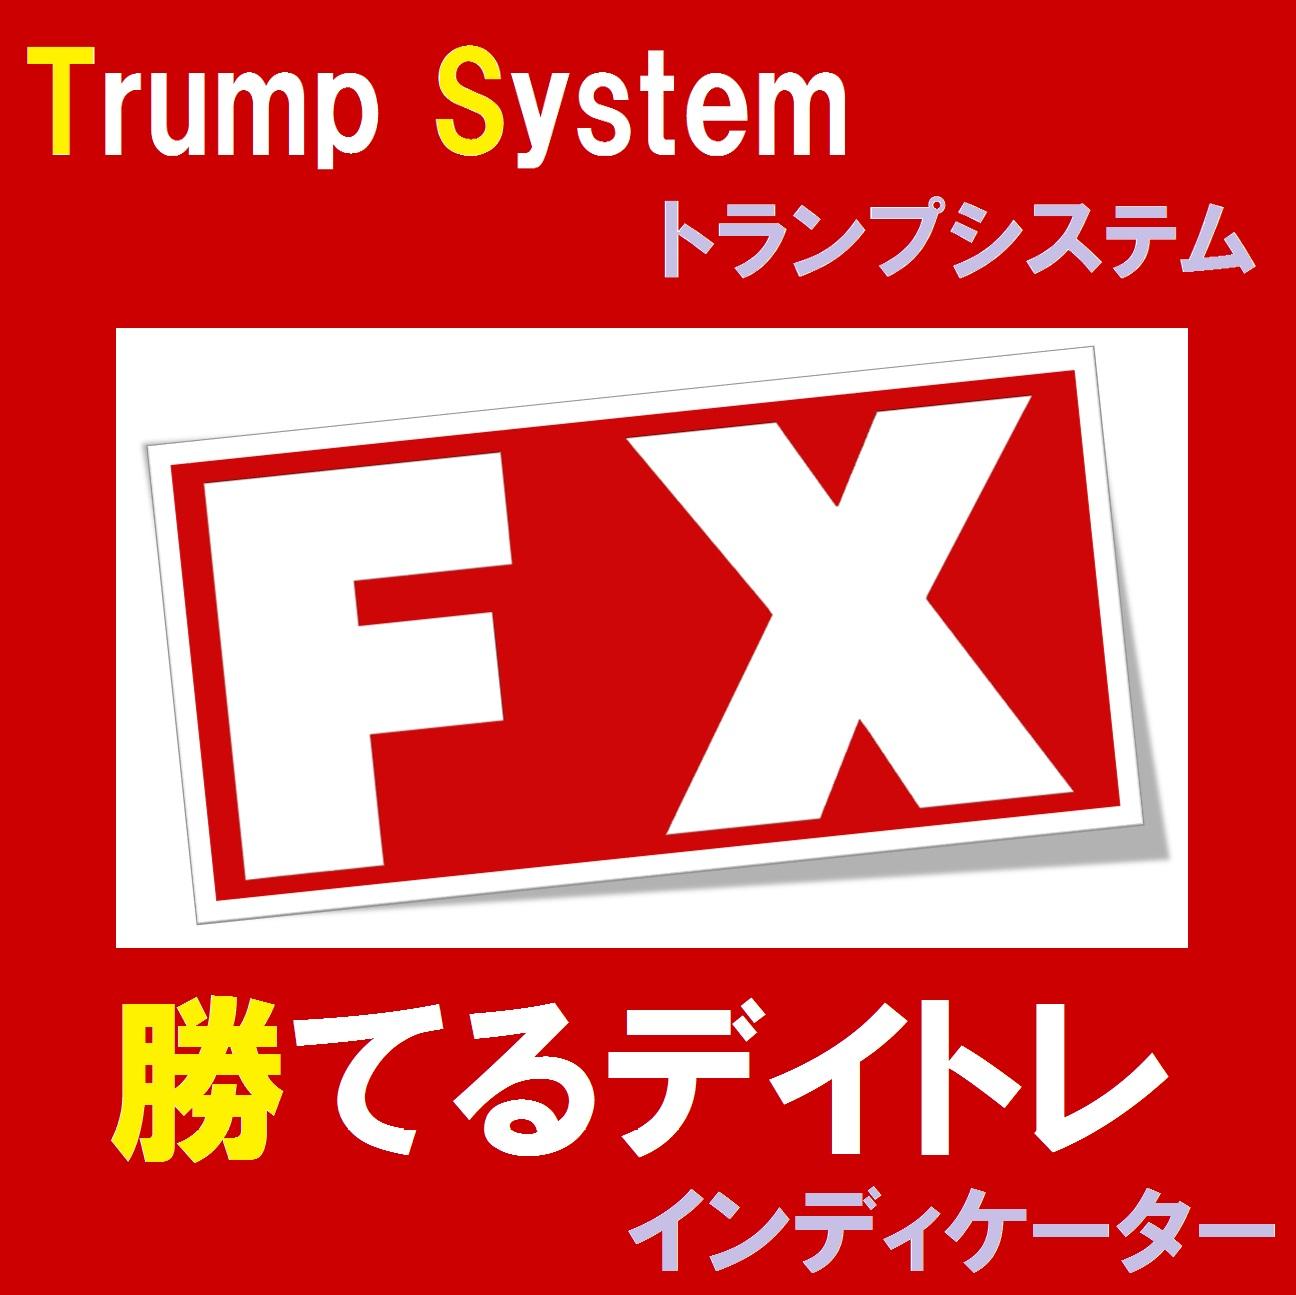 Trump System